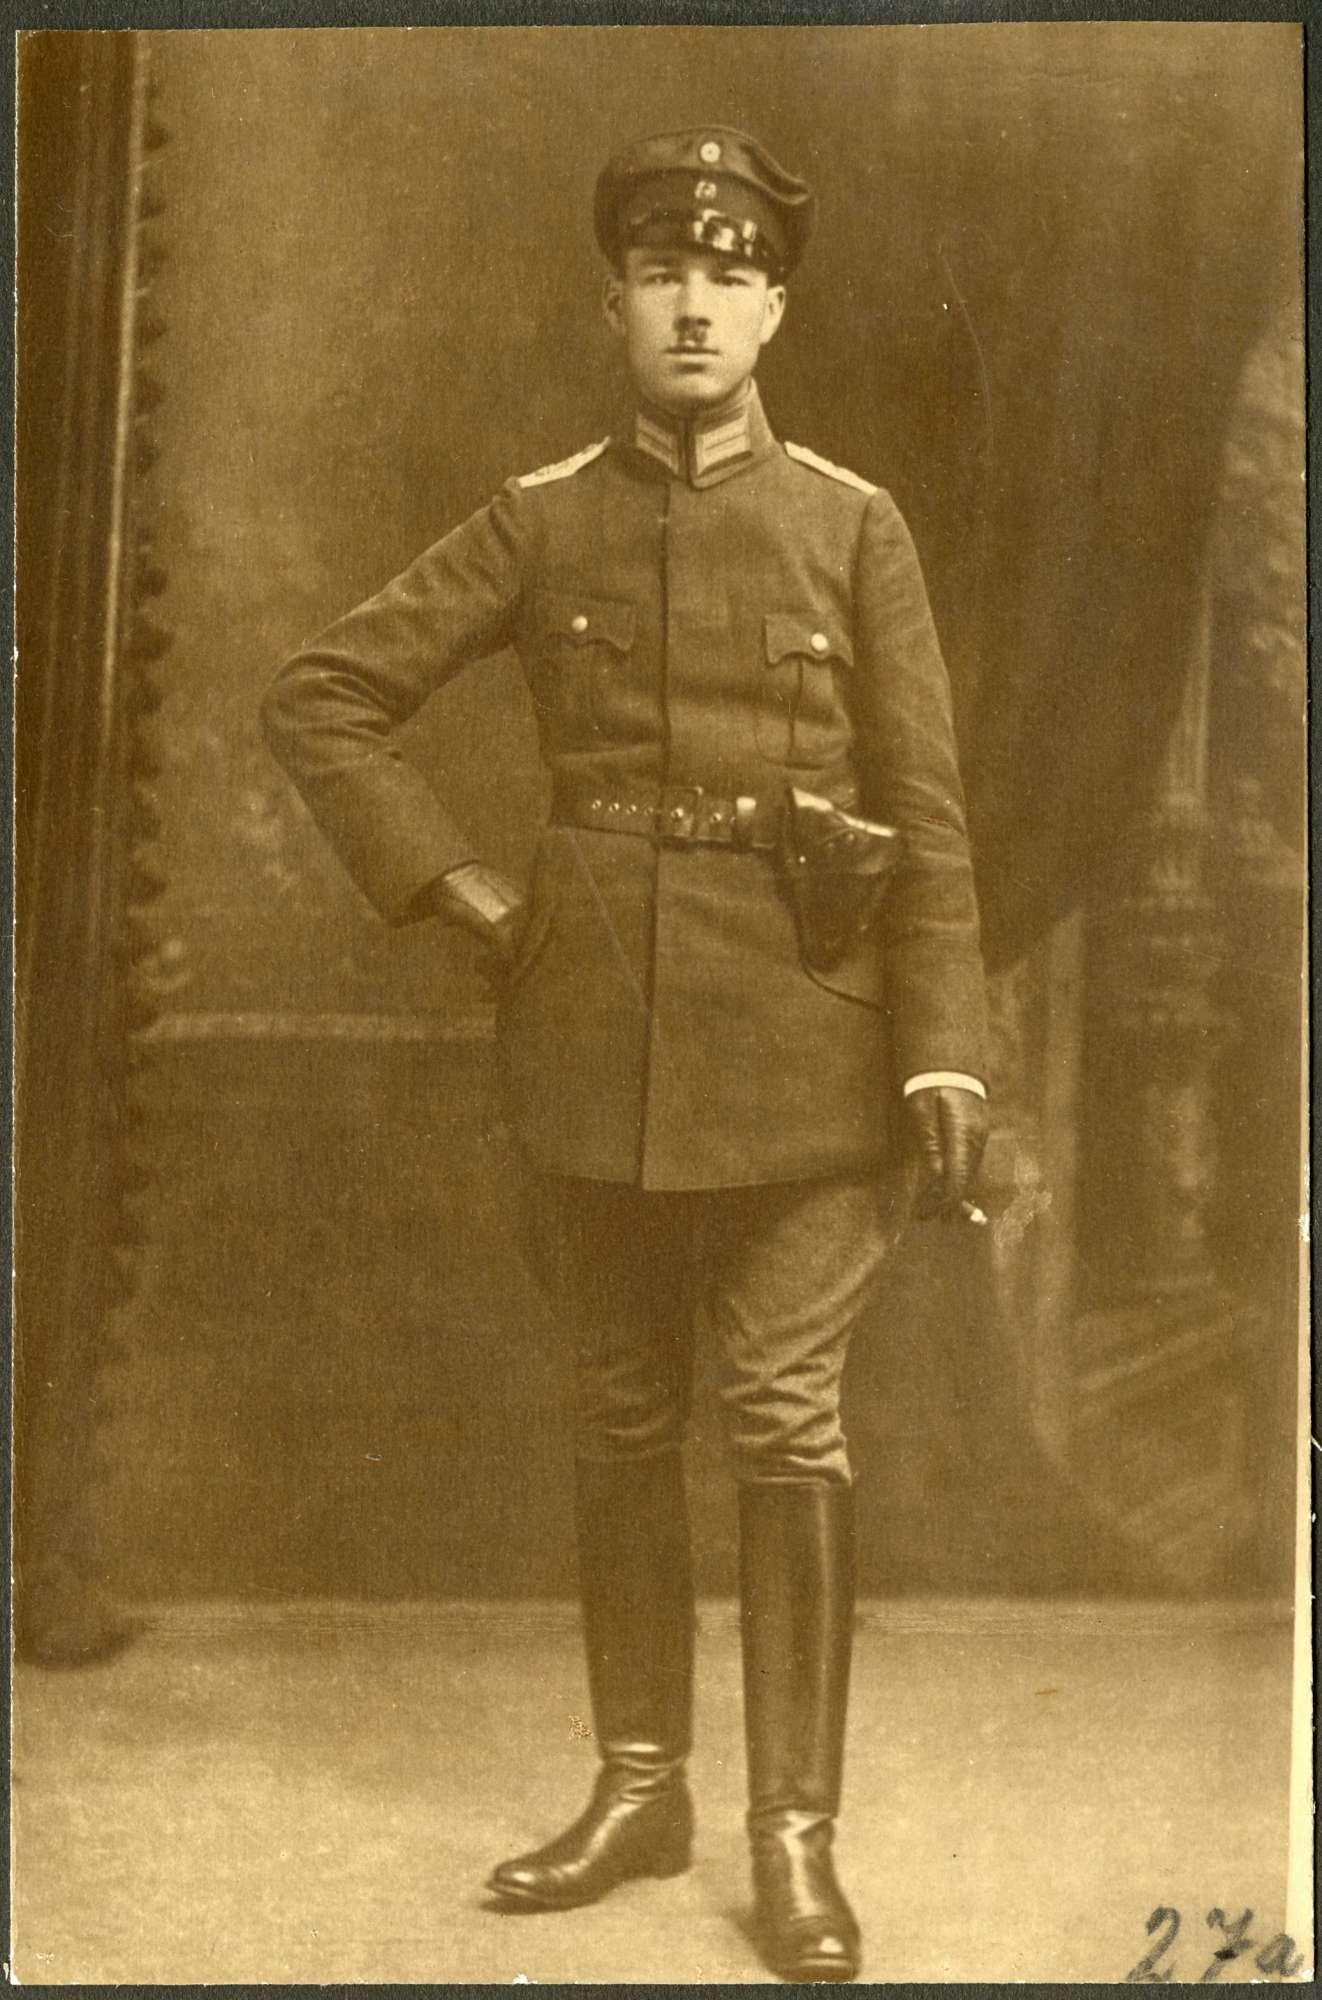 Rau, Ludwig, Bild 1